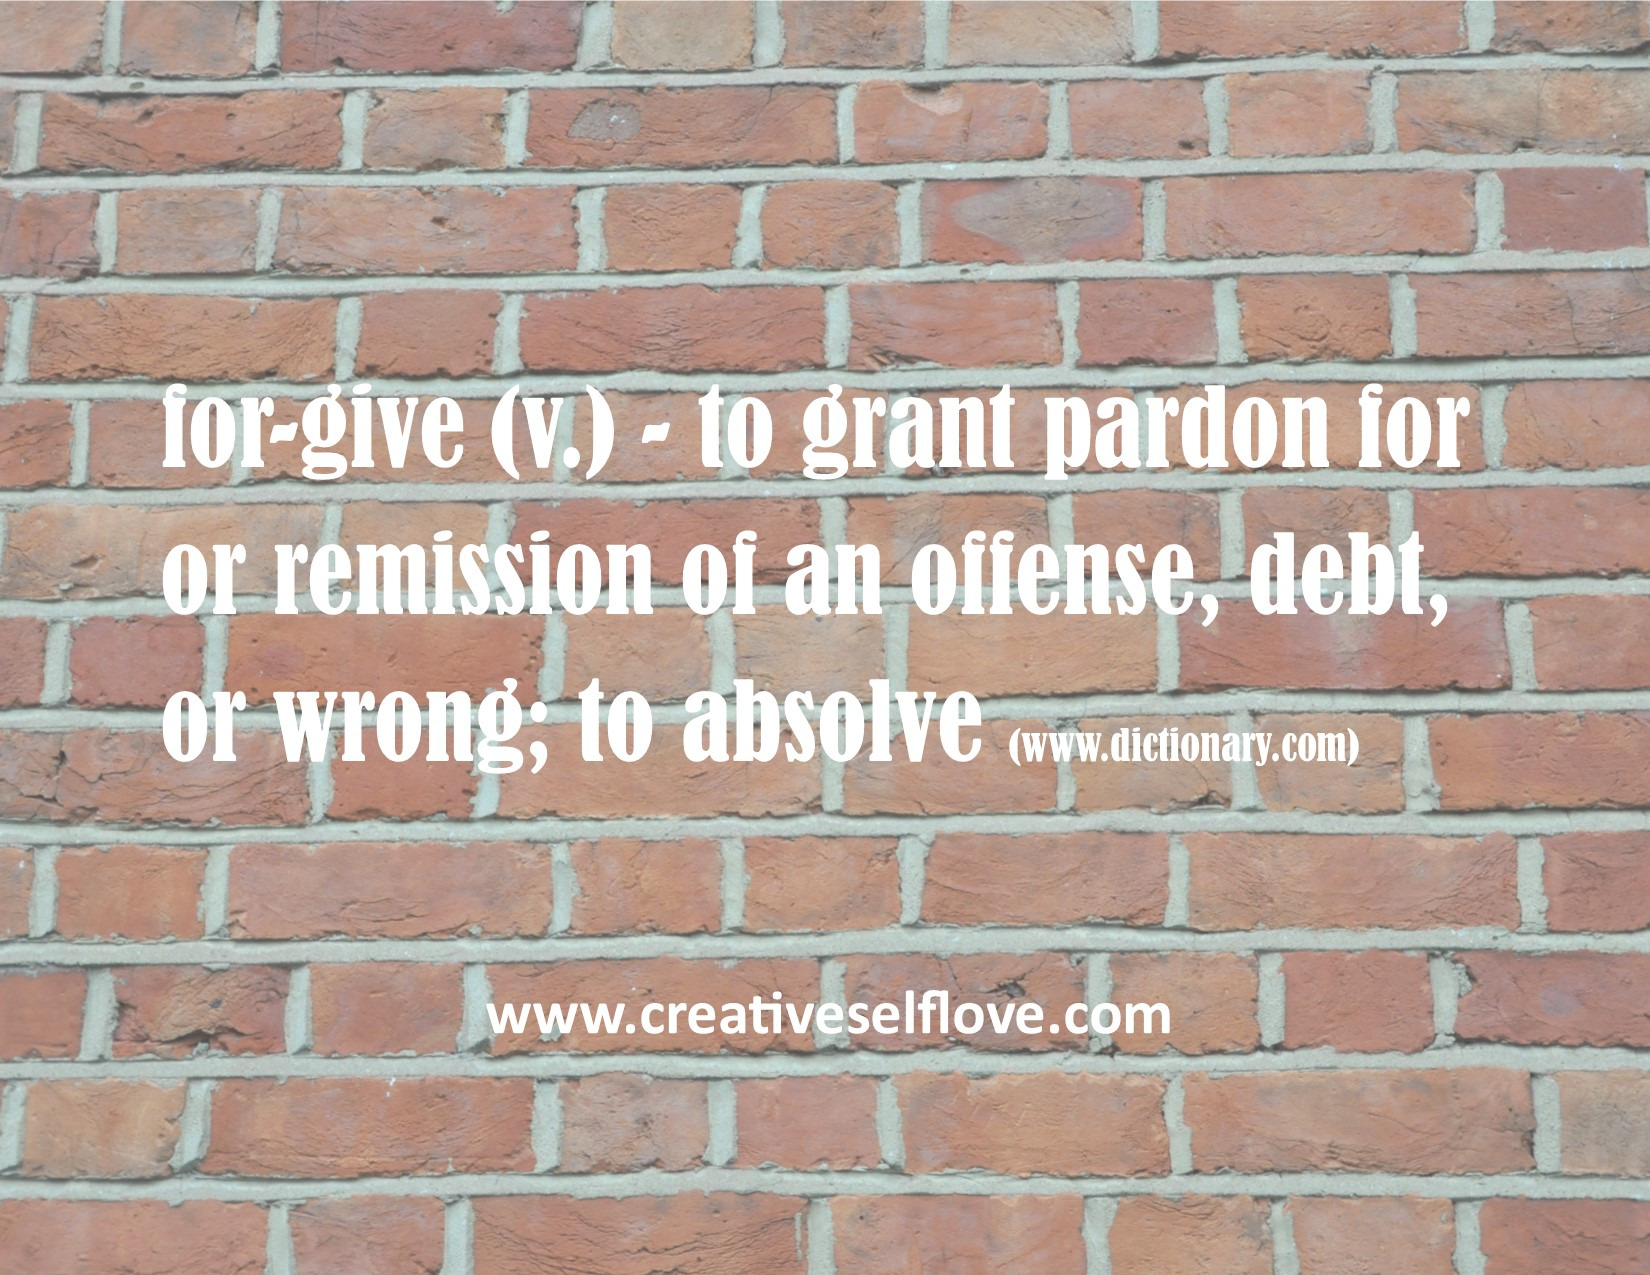 ♥Forgive – Graphics by author; Photo: public domain